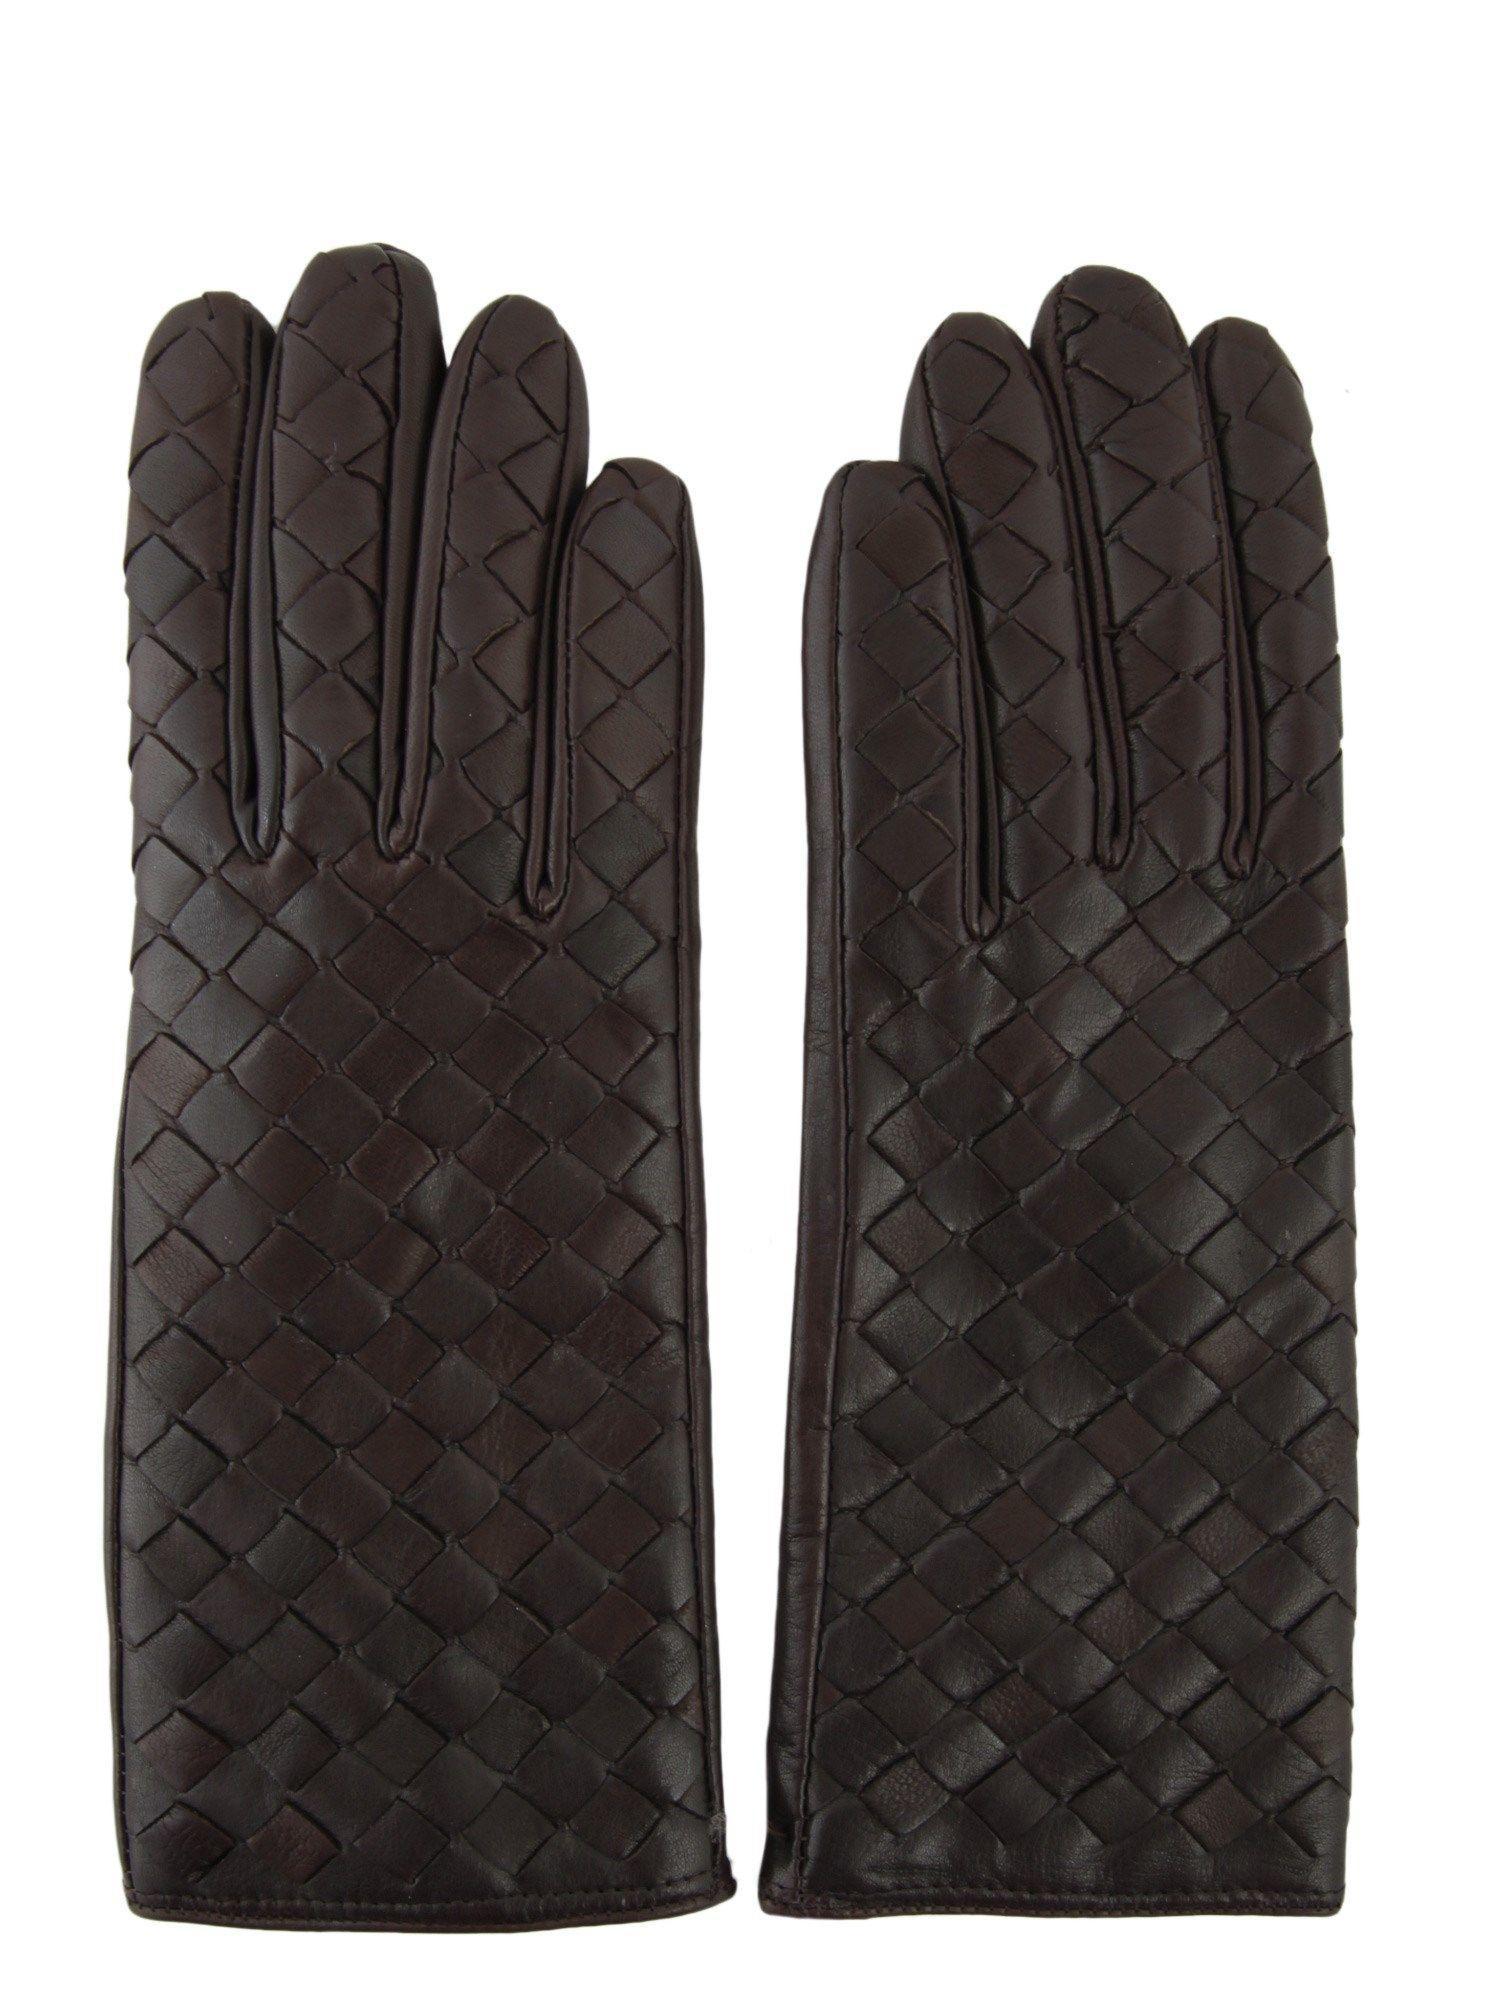 Sermoneta Gloves Ladies Gloves In Testa Di Moro